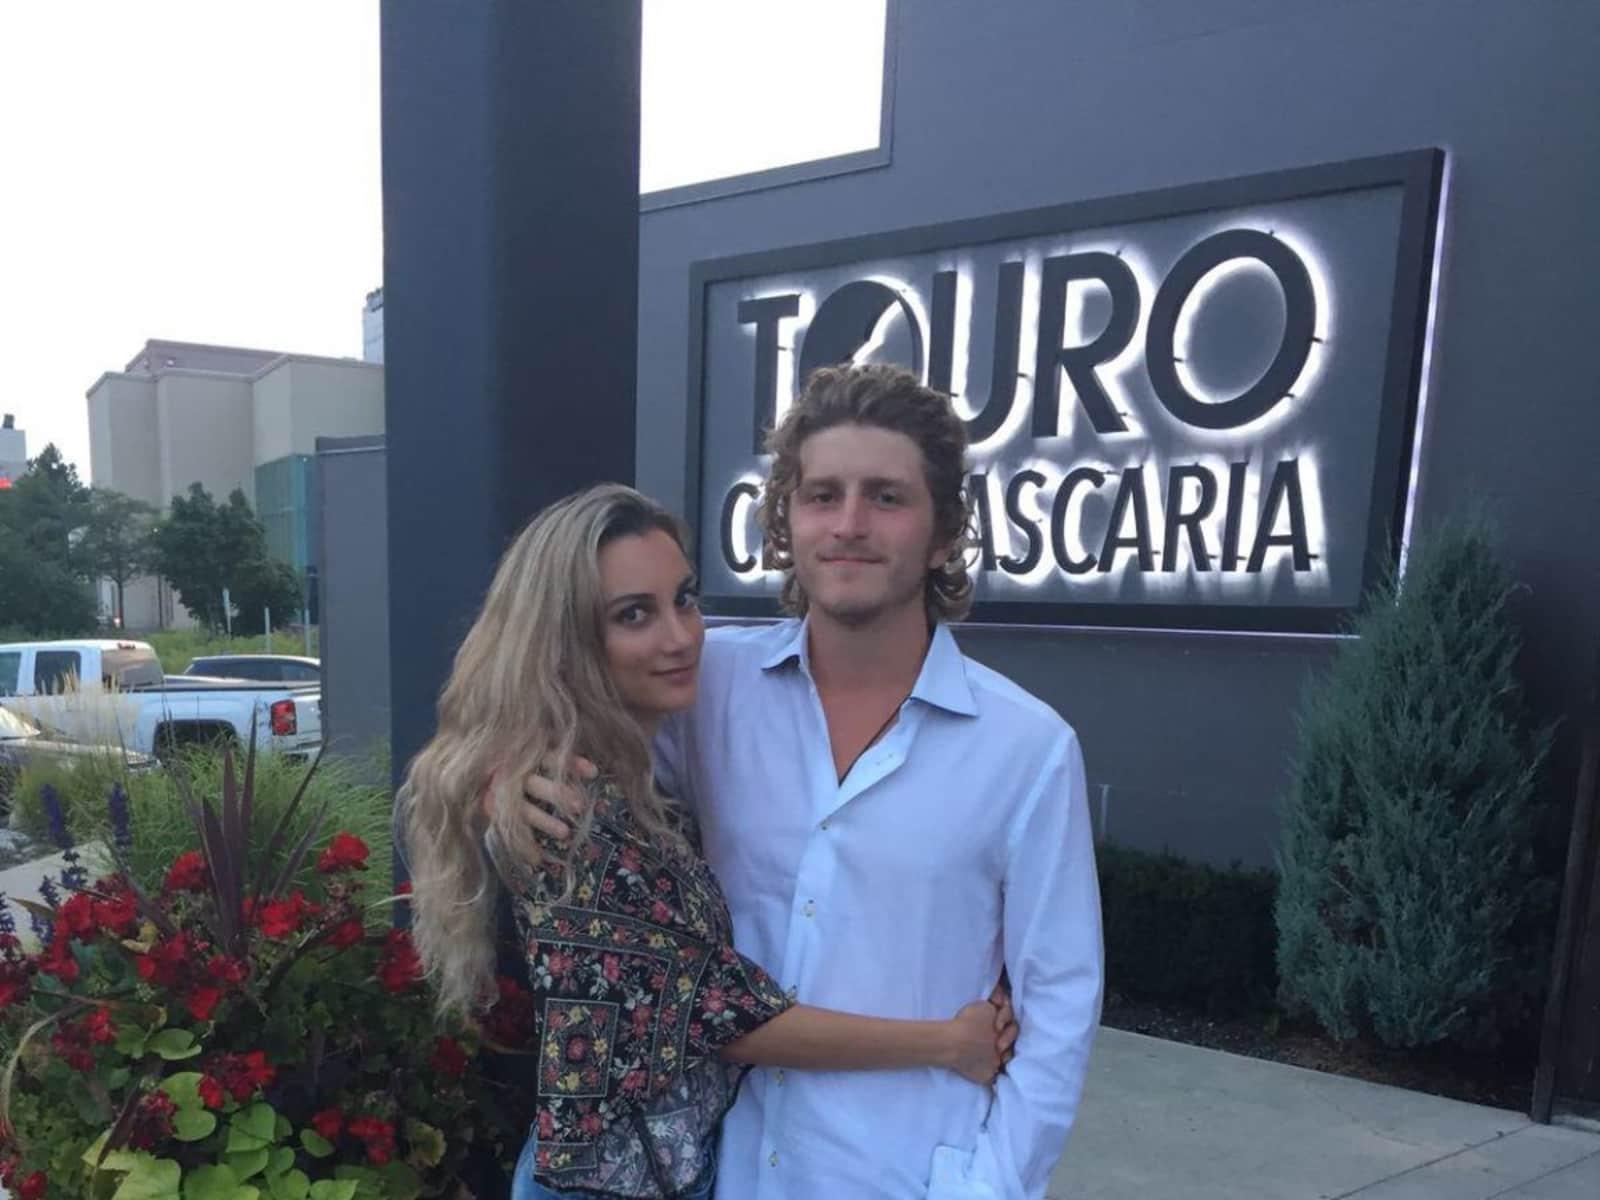 Nolan & Tania from Kingston, Ontario, Canada